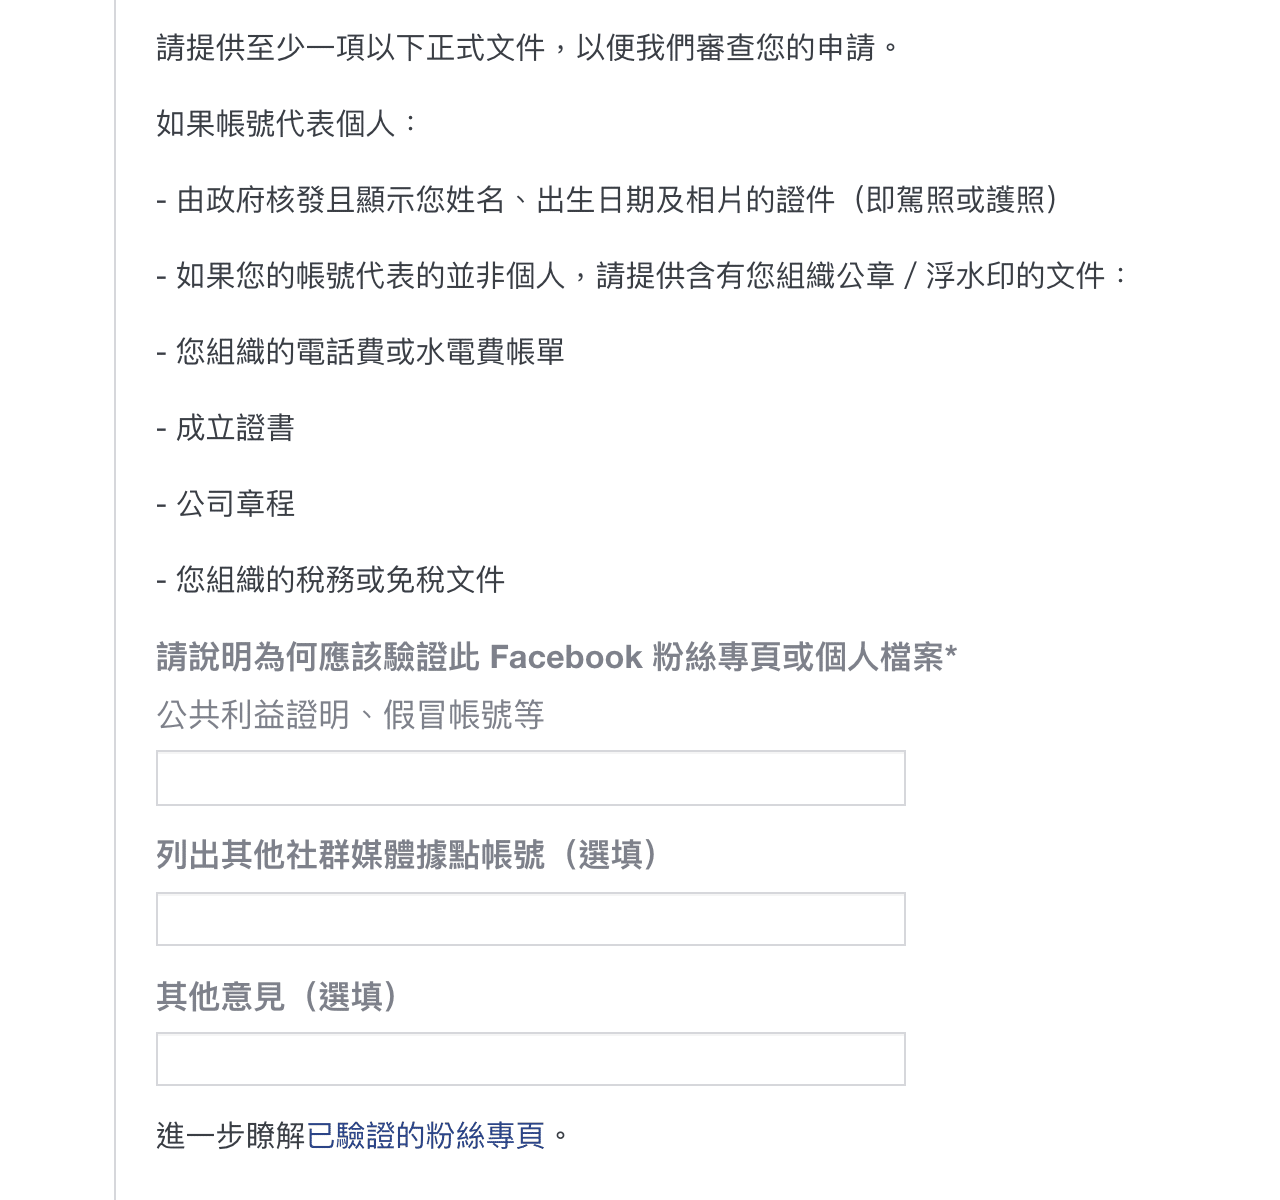 Facebook 申請藍色驗證標章